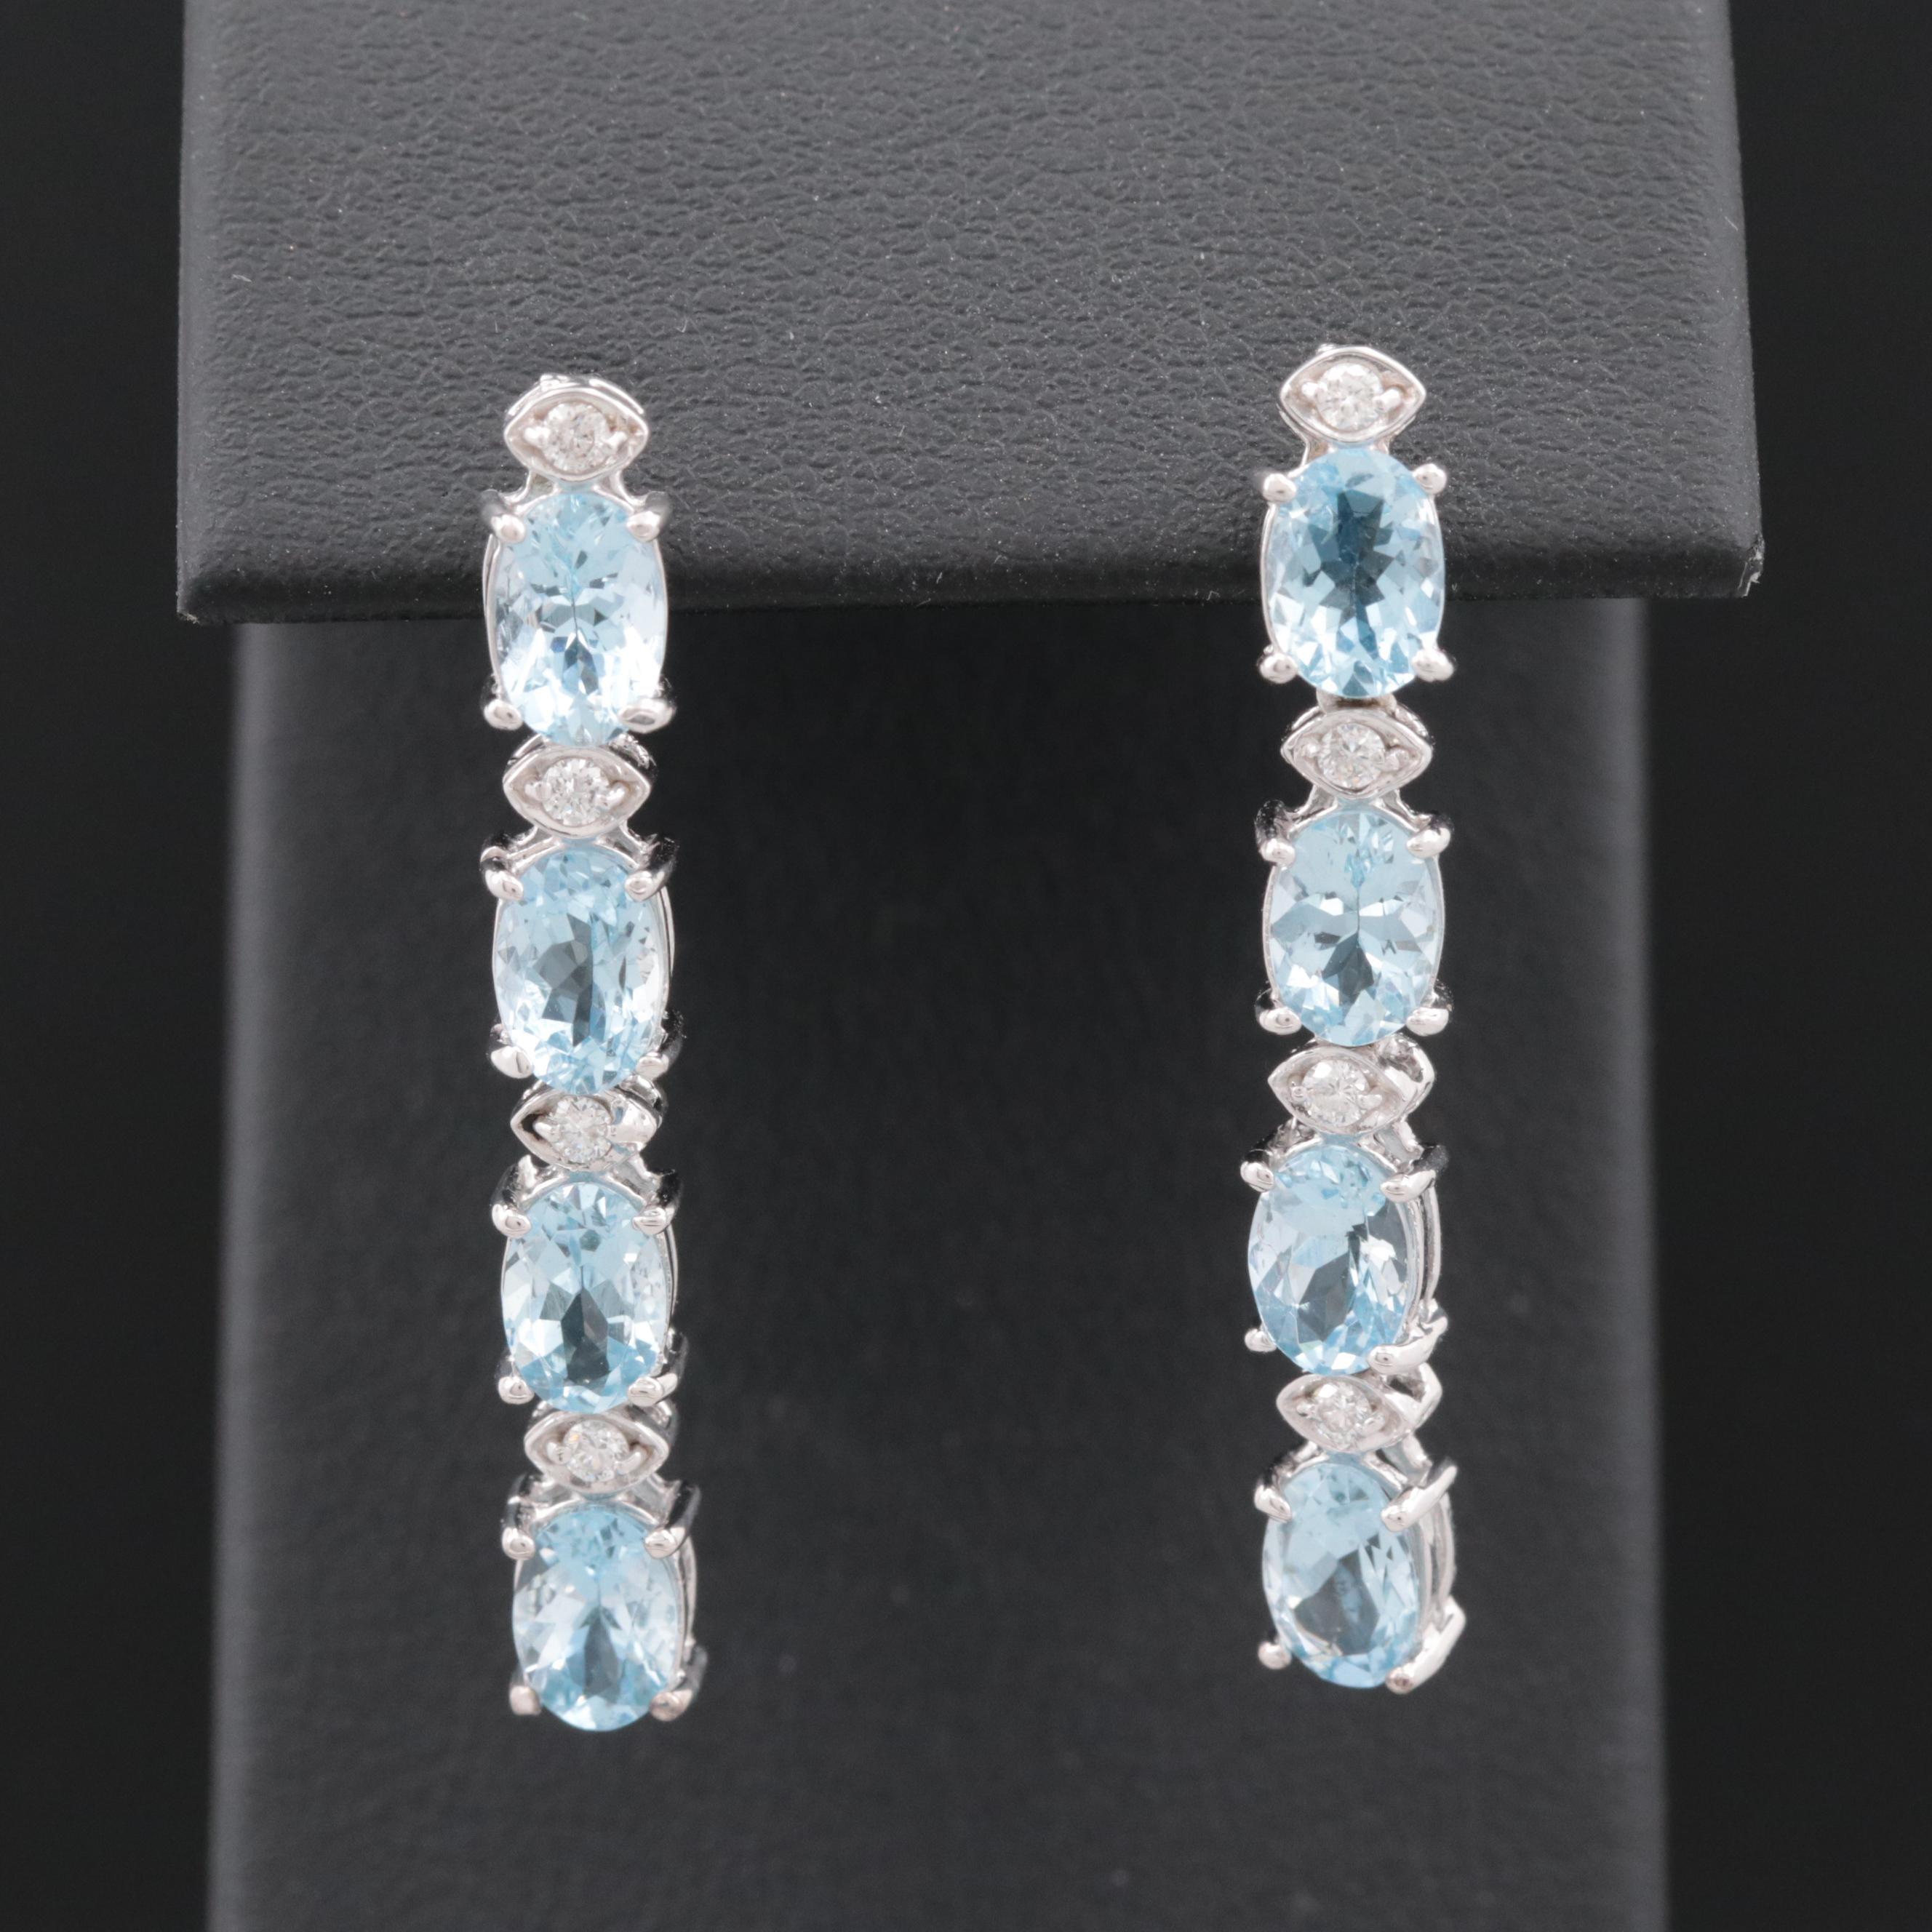 18K White Gold Aquamarine and Diamond Dangle Earrings